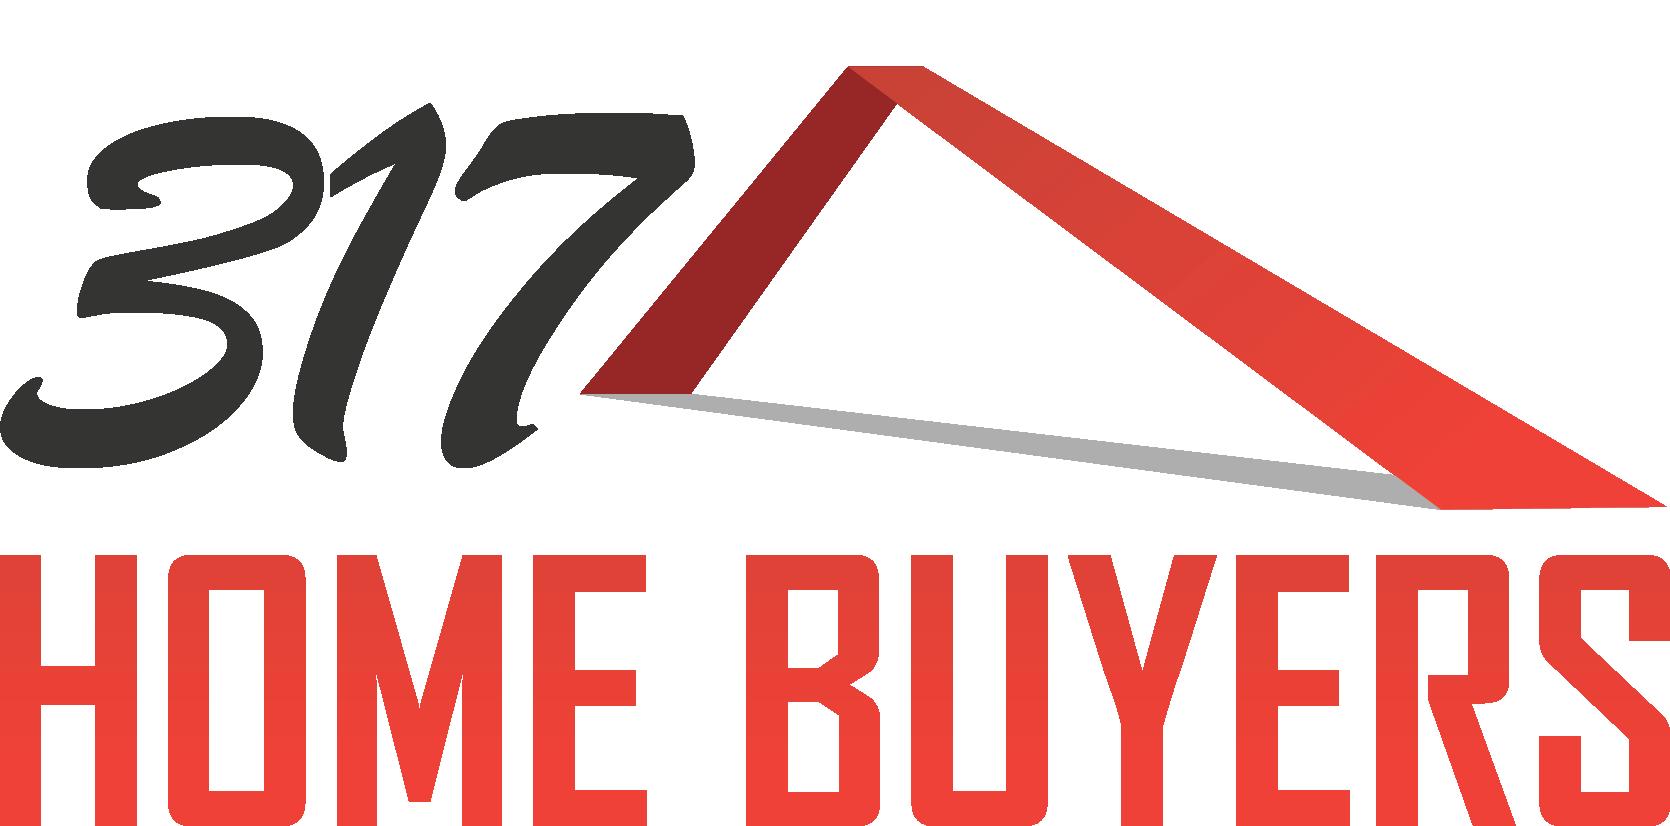 317 Home Buyers  logo